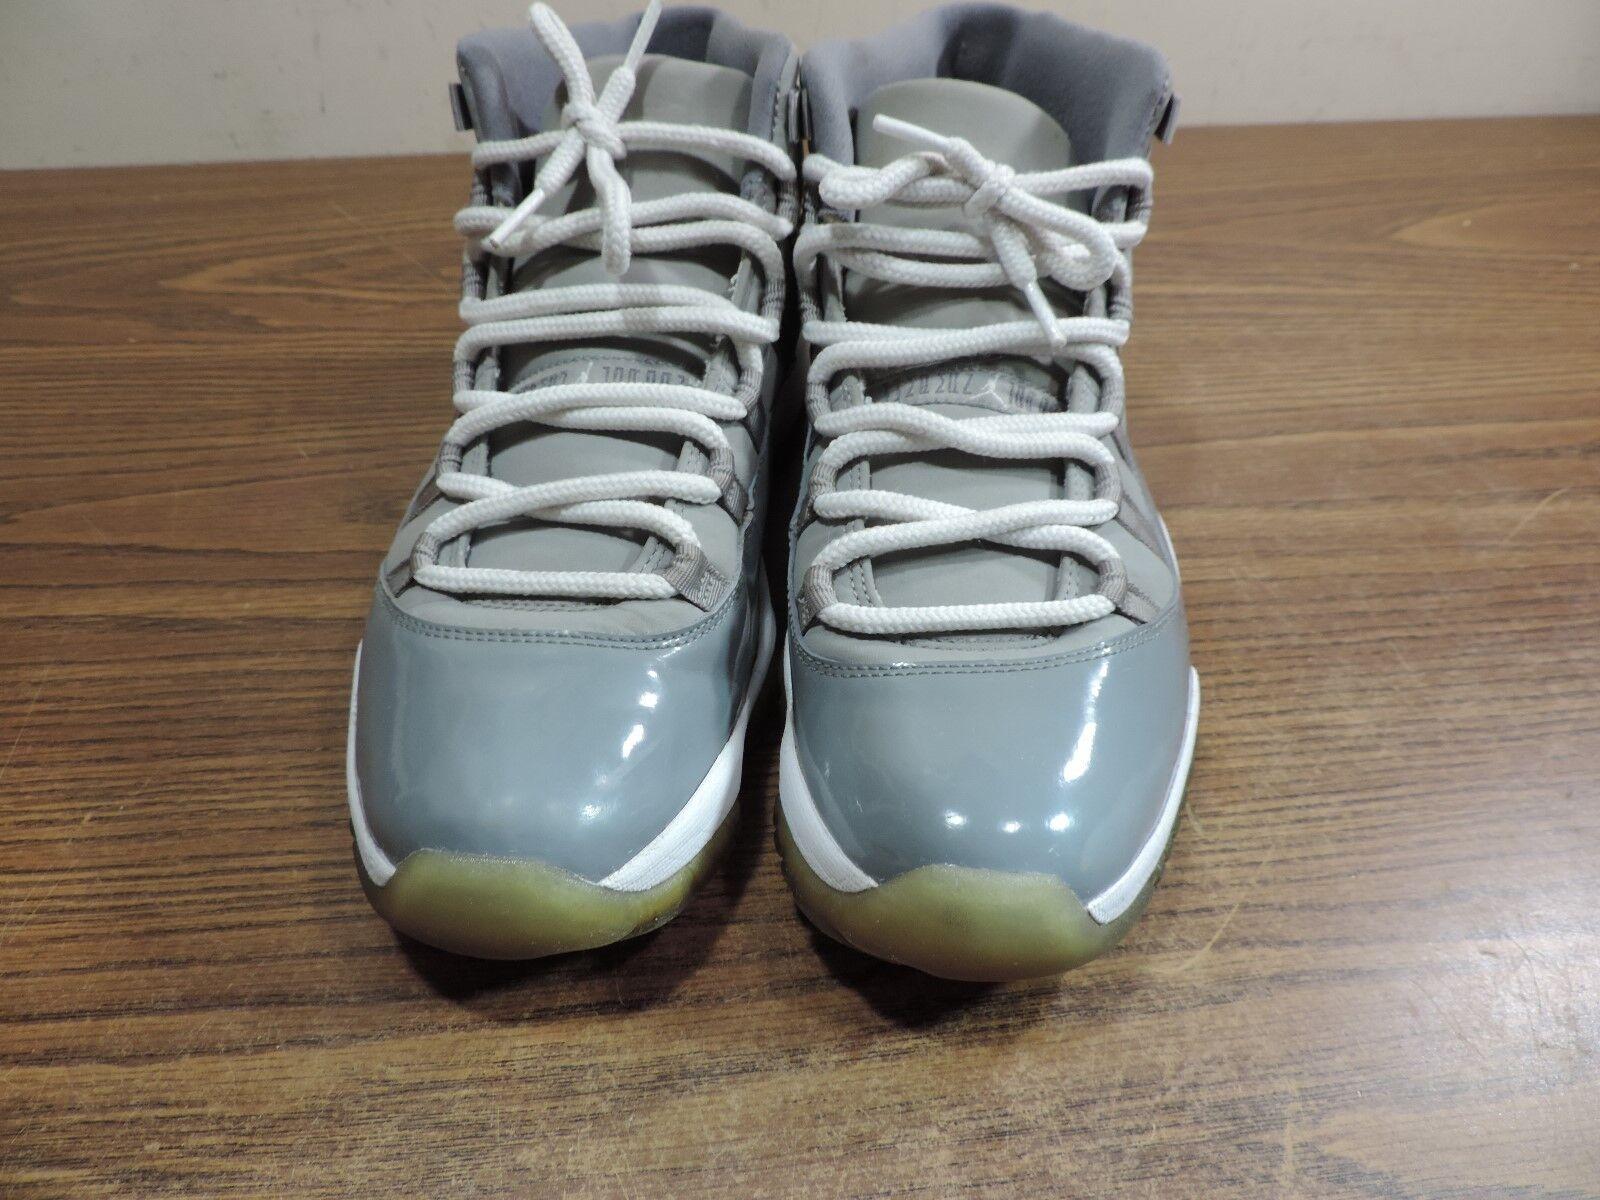 2010 Nike Air Jordan 11 XI Retro Cool Grey White 378037-001 - Size 10.5